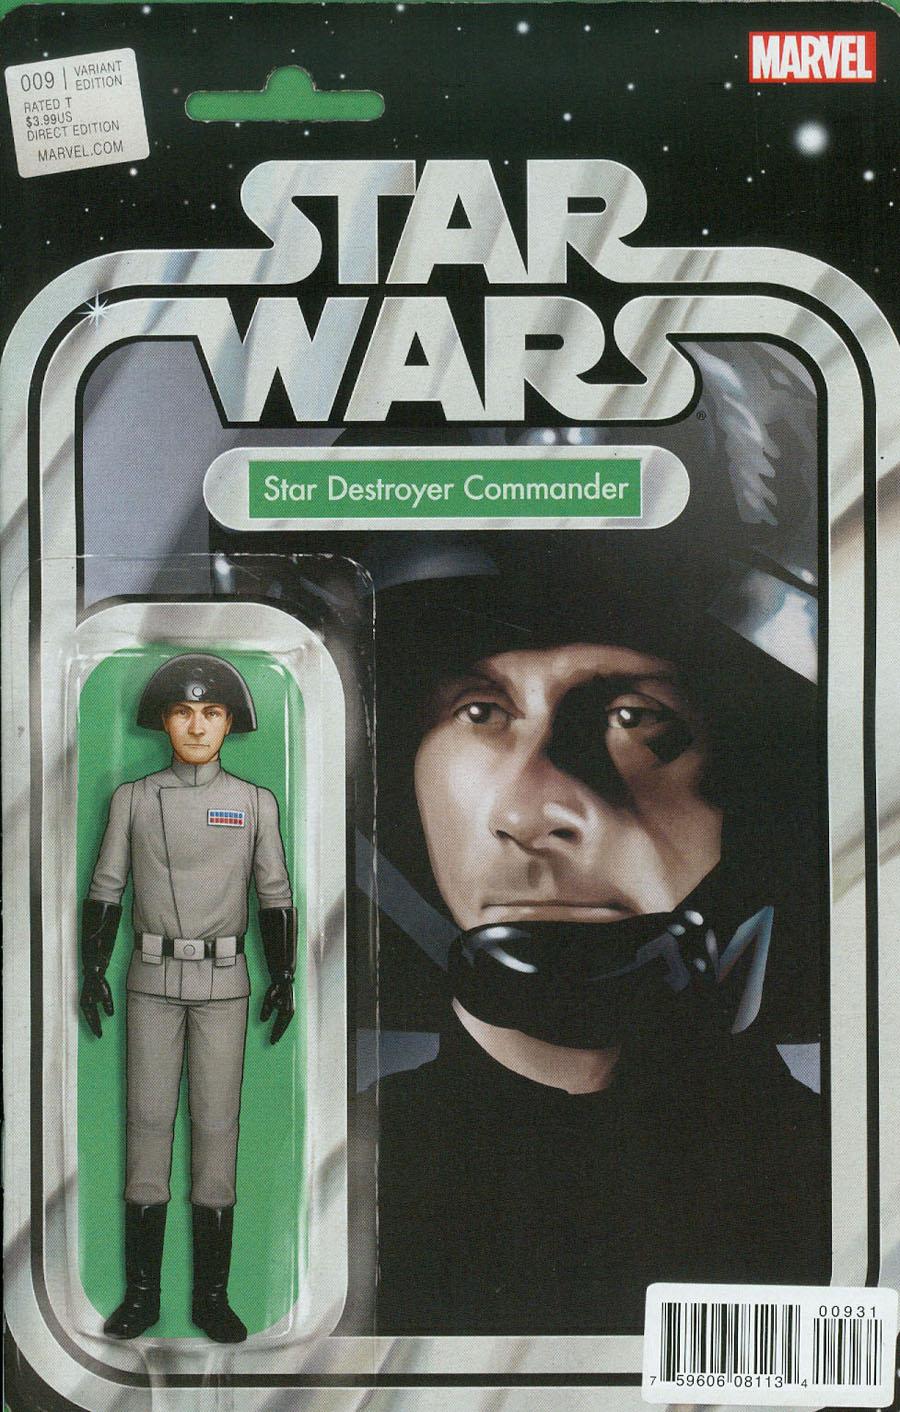 Star Wars Vol 4 #9 Cover B Variant John Tyler Christopher Action Figure Cover